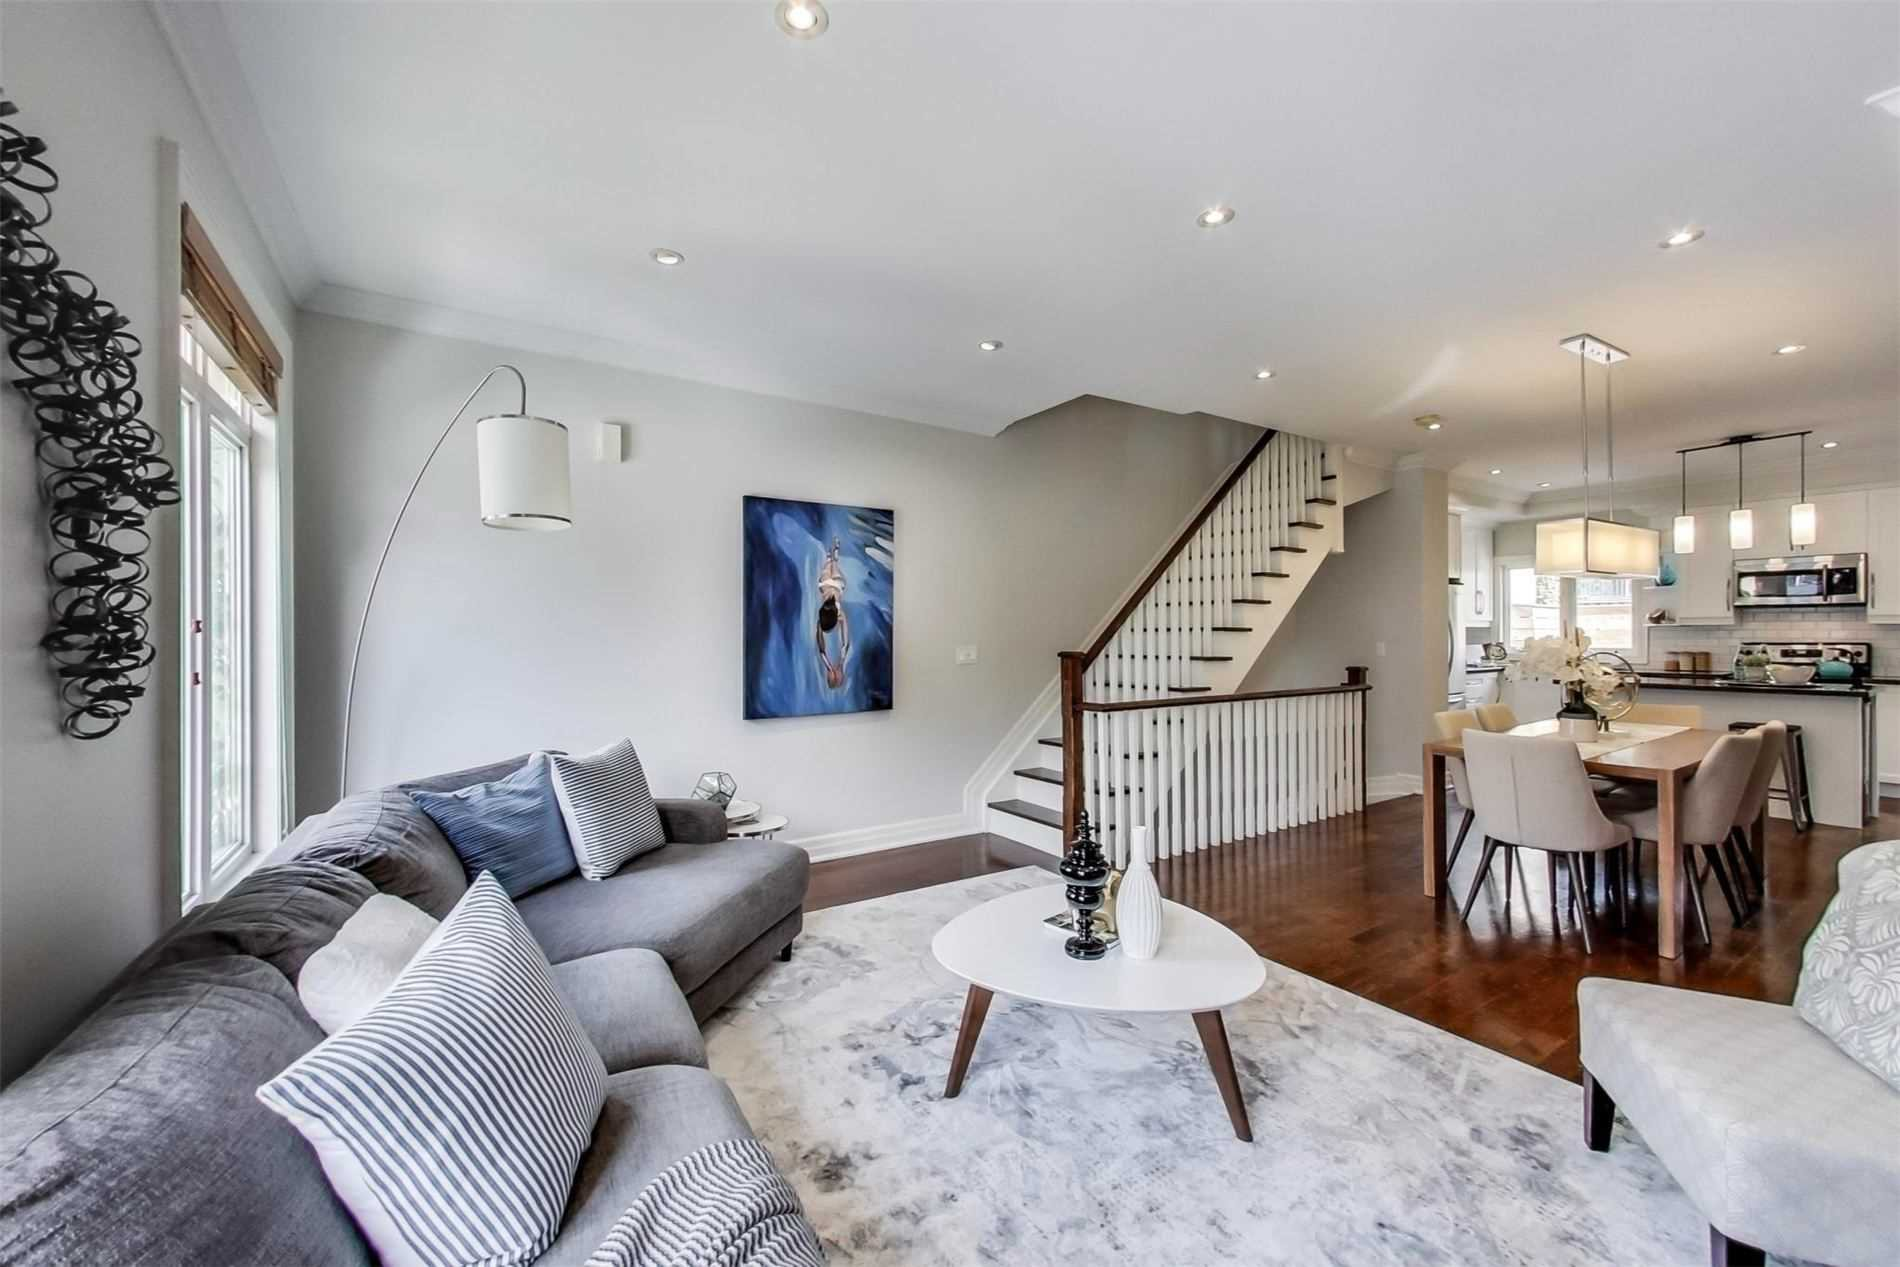 Photo 4: Photos: 213 Heward Avenue in Toronto: South Riverdale House (3-Storey) for sale (Toronto E01)  : MLS®# E4941877